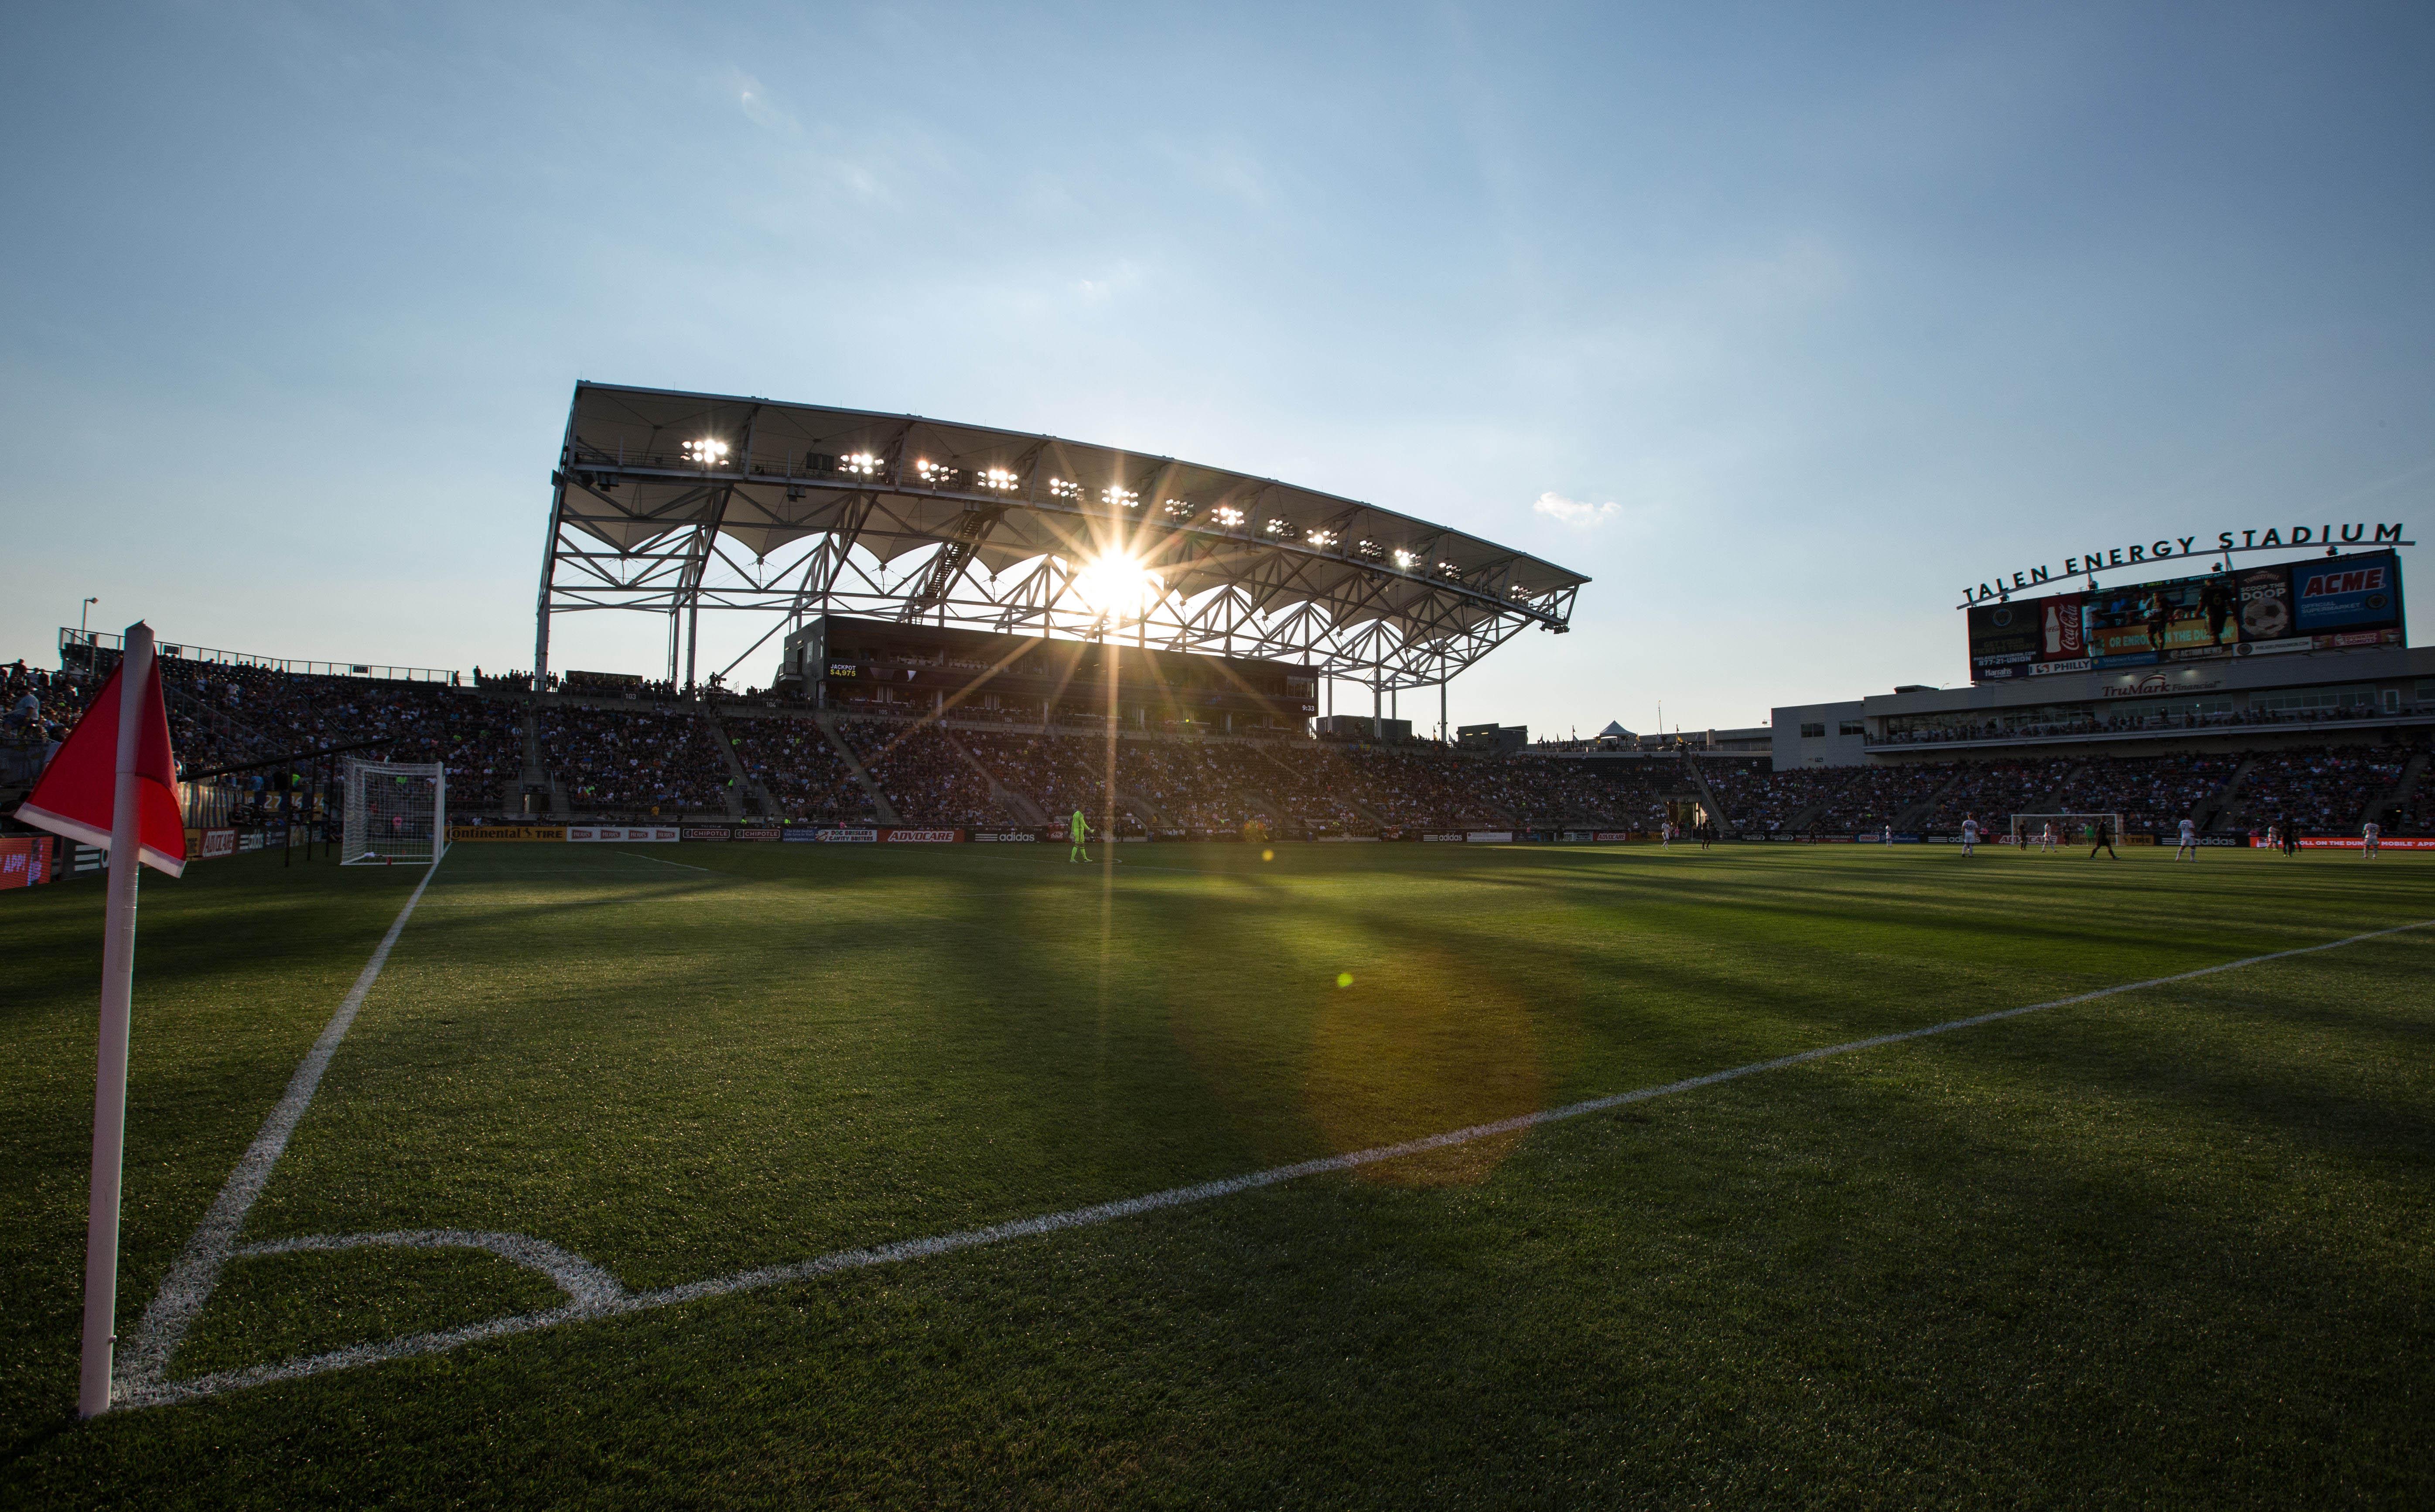 MLS: Vancouver Whitecaps FC at Philadelphia Union